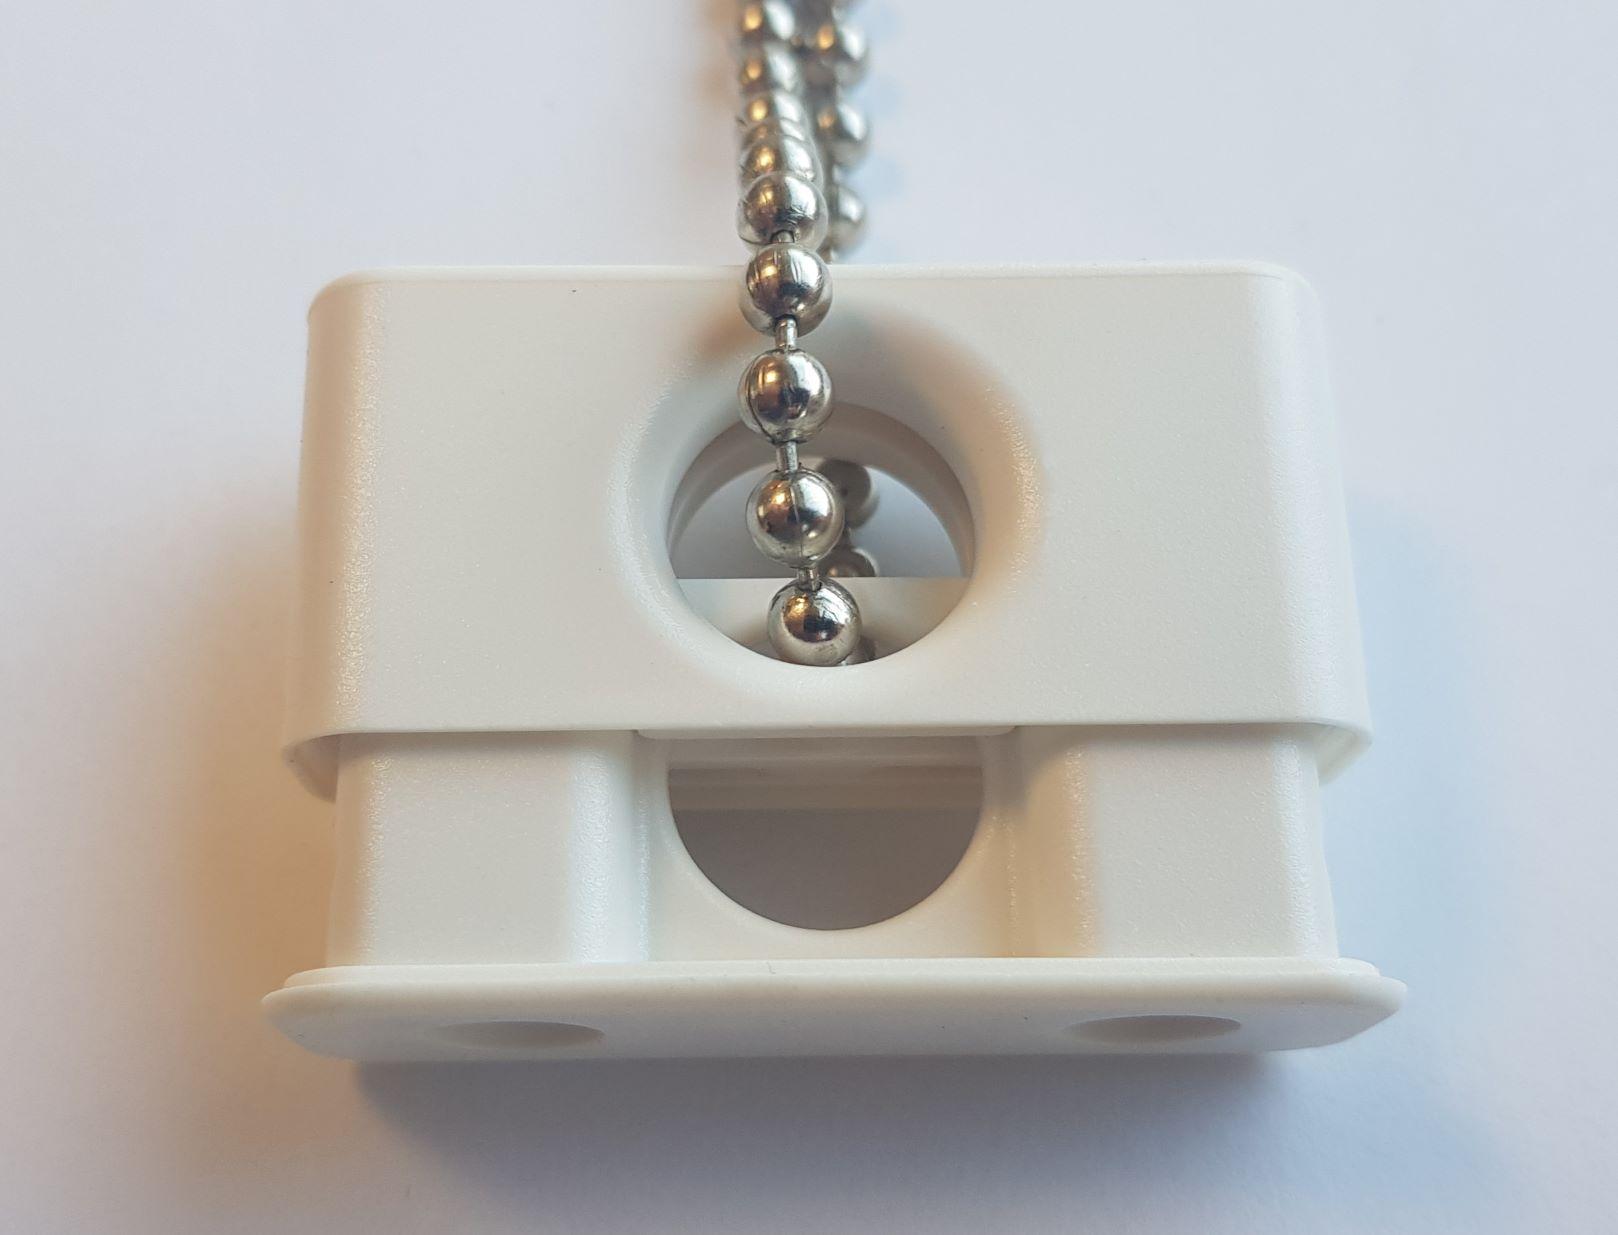 EN16434 S-Lock Safety Device (white)